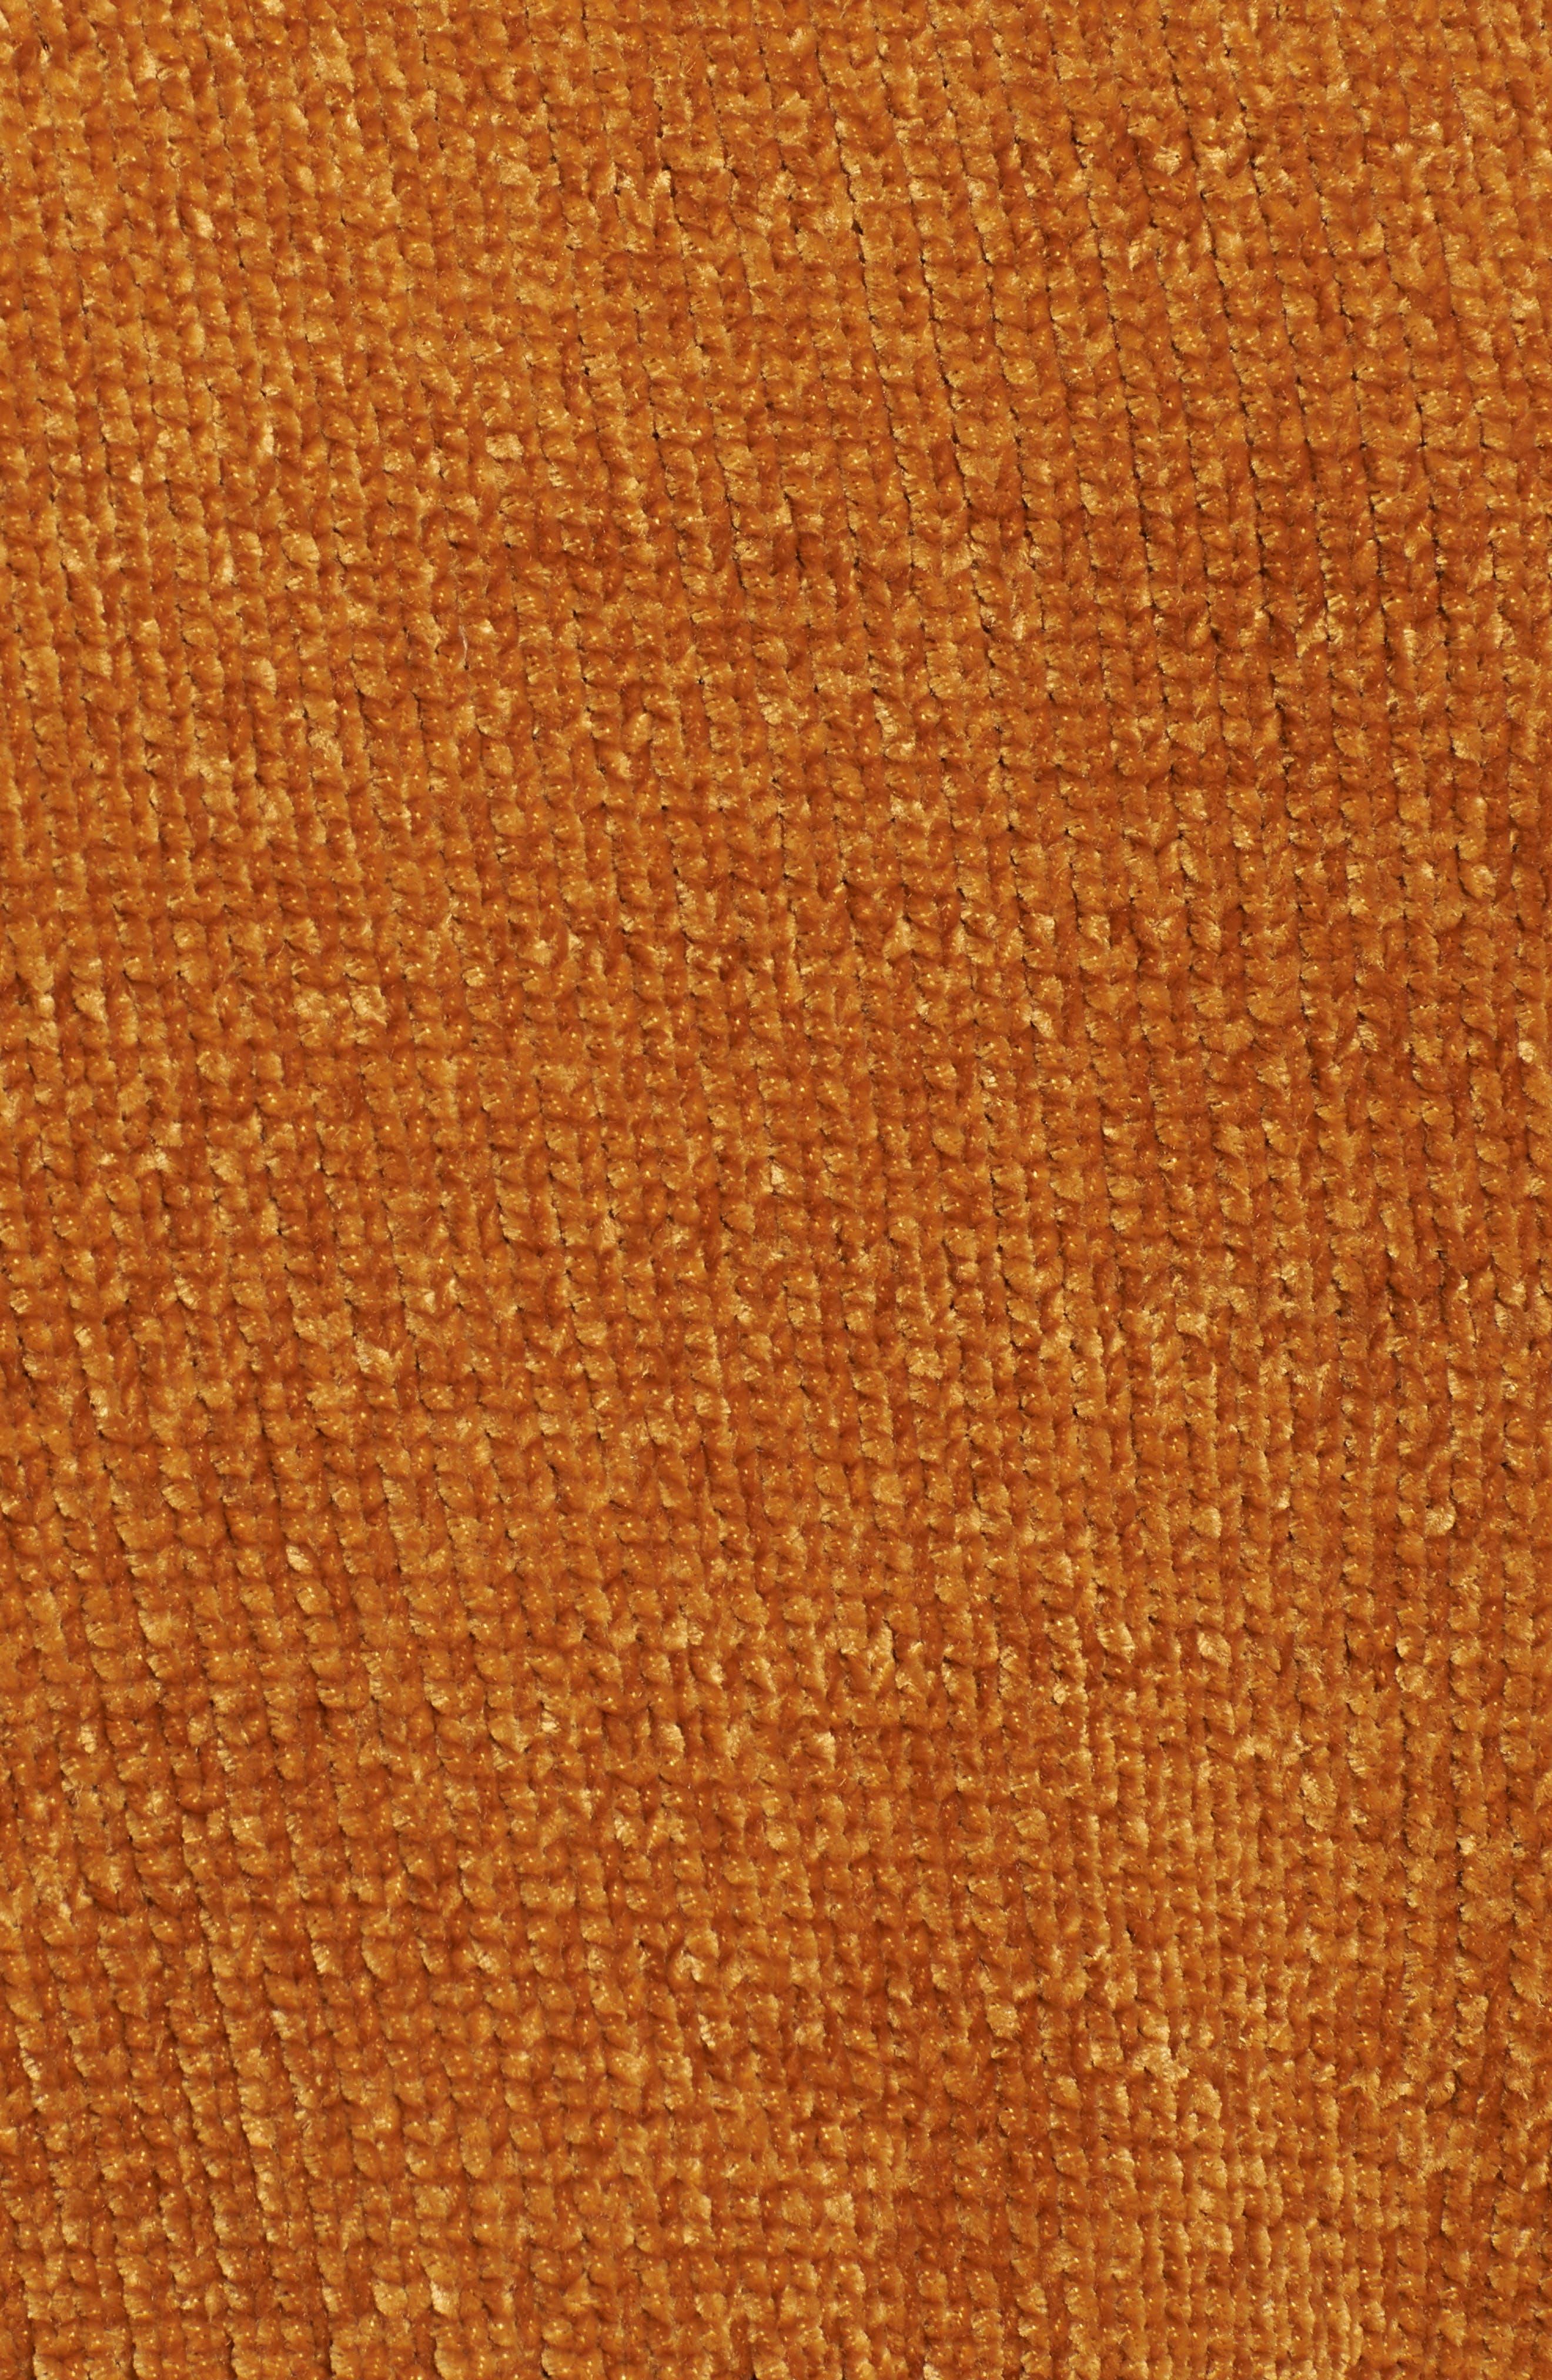 Stripe Sleeve Chenille Sweater,                             Alternate thumbnail 5, color,                             700